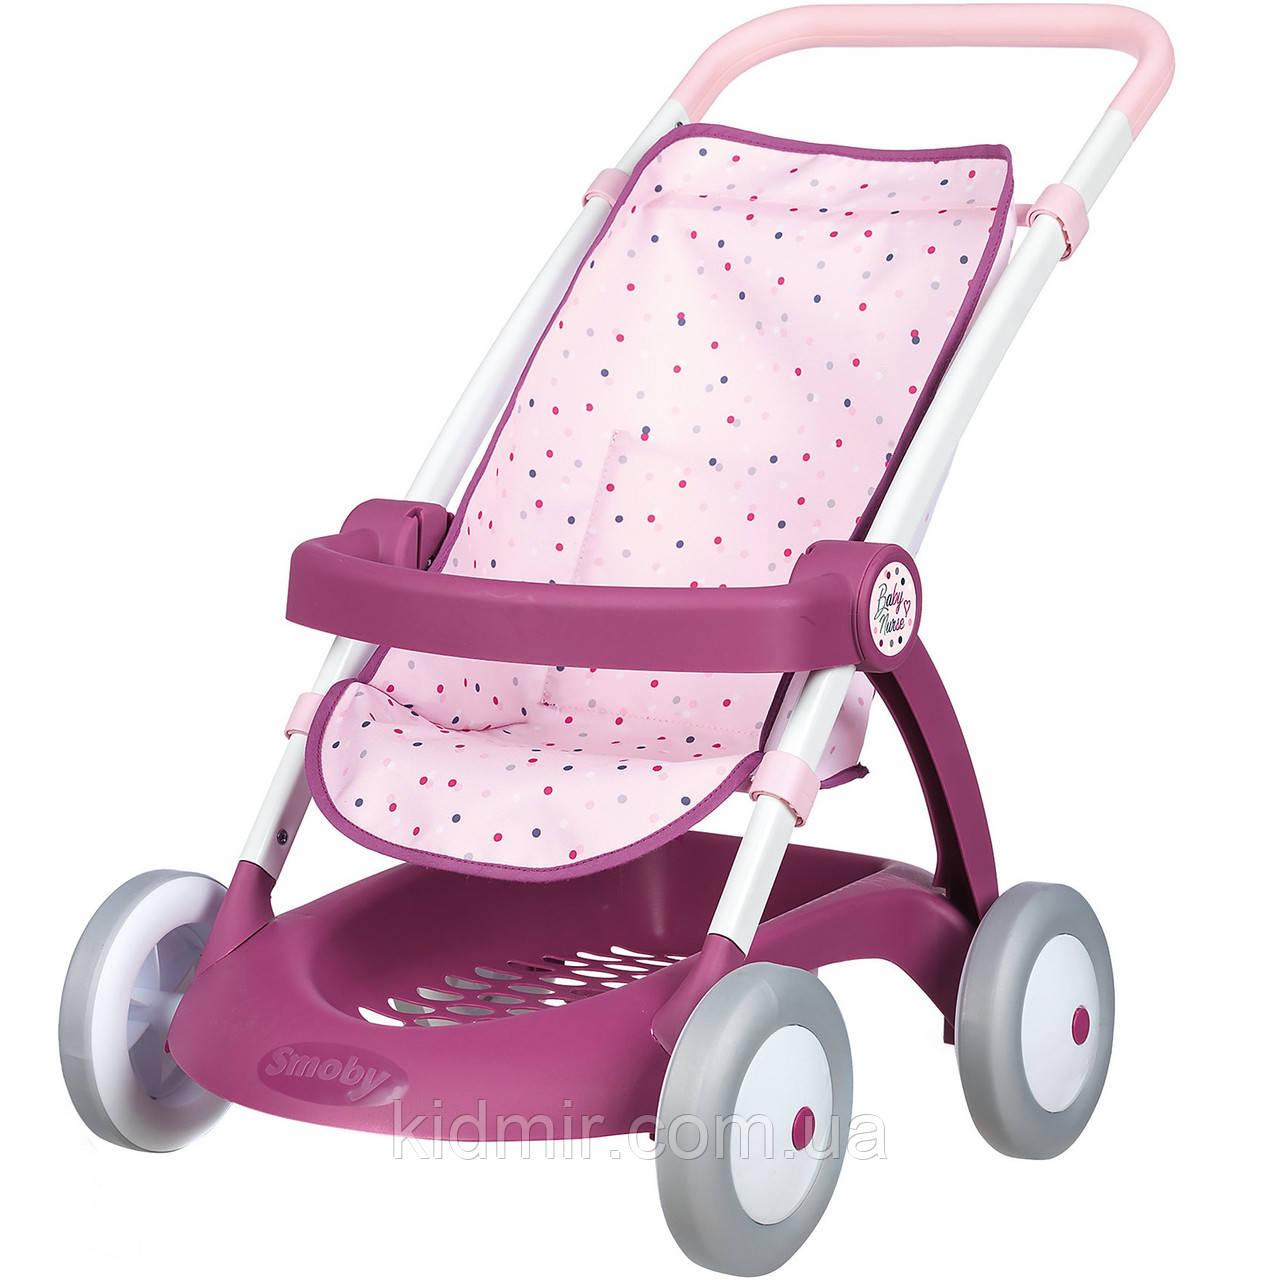 Коляска для куклы Прованс Прогулка Baby Nurse Smoby 254003